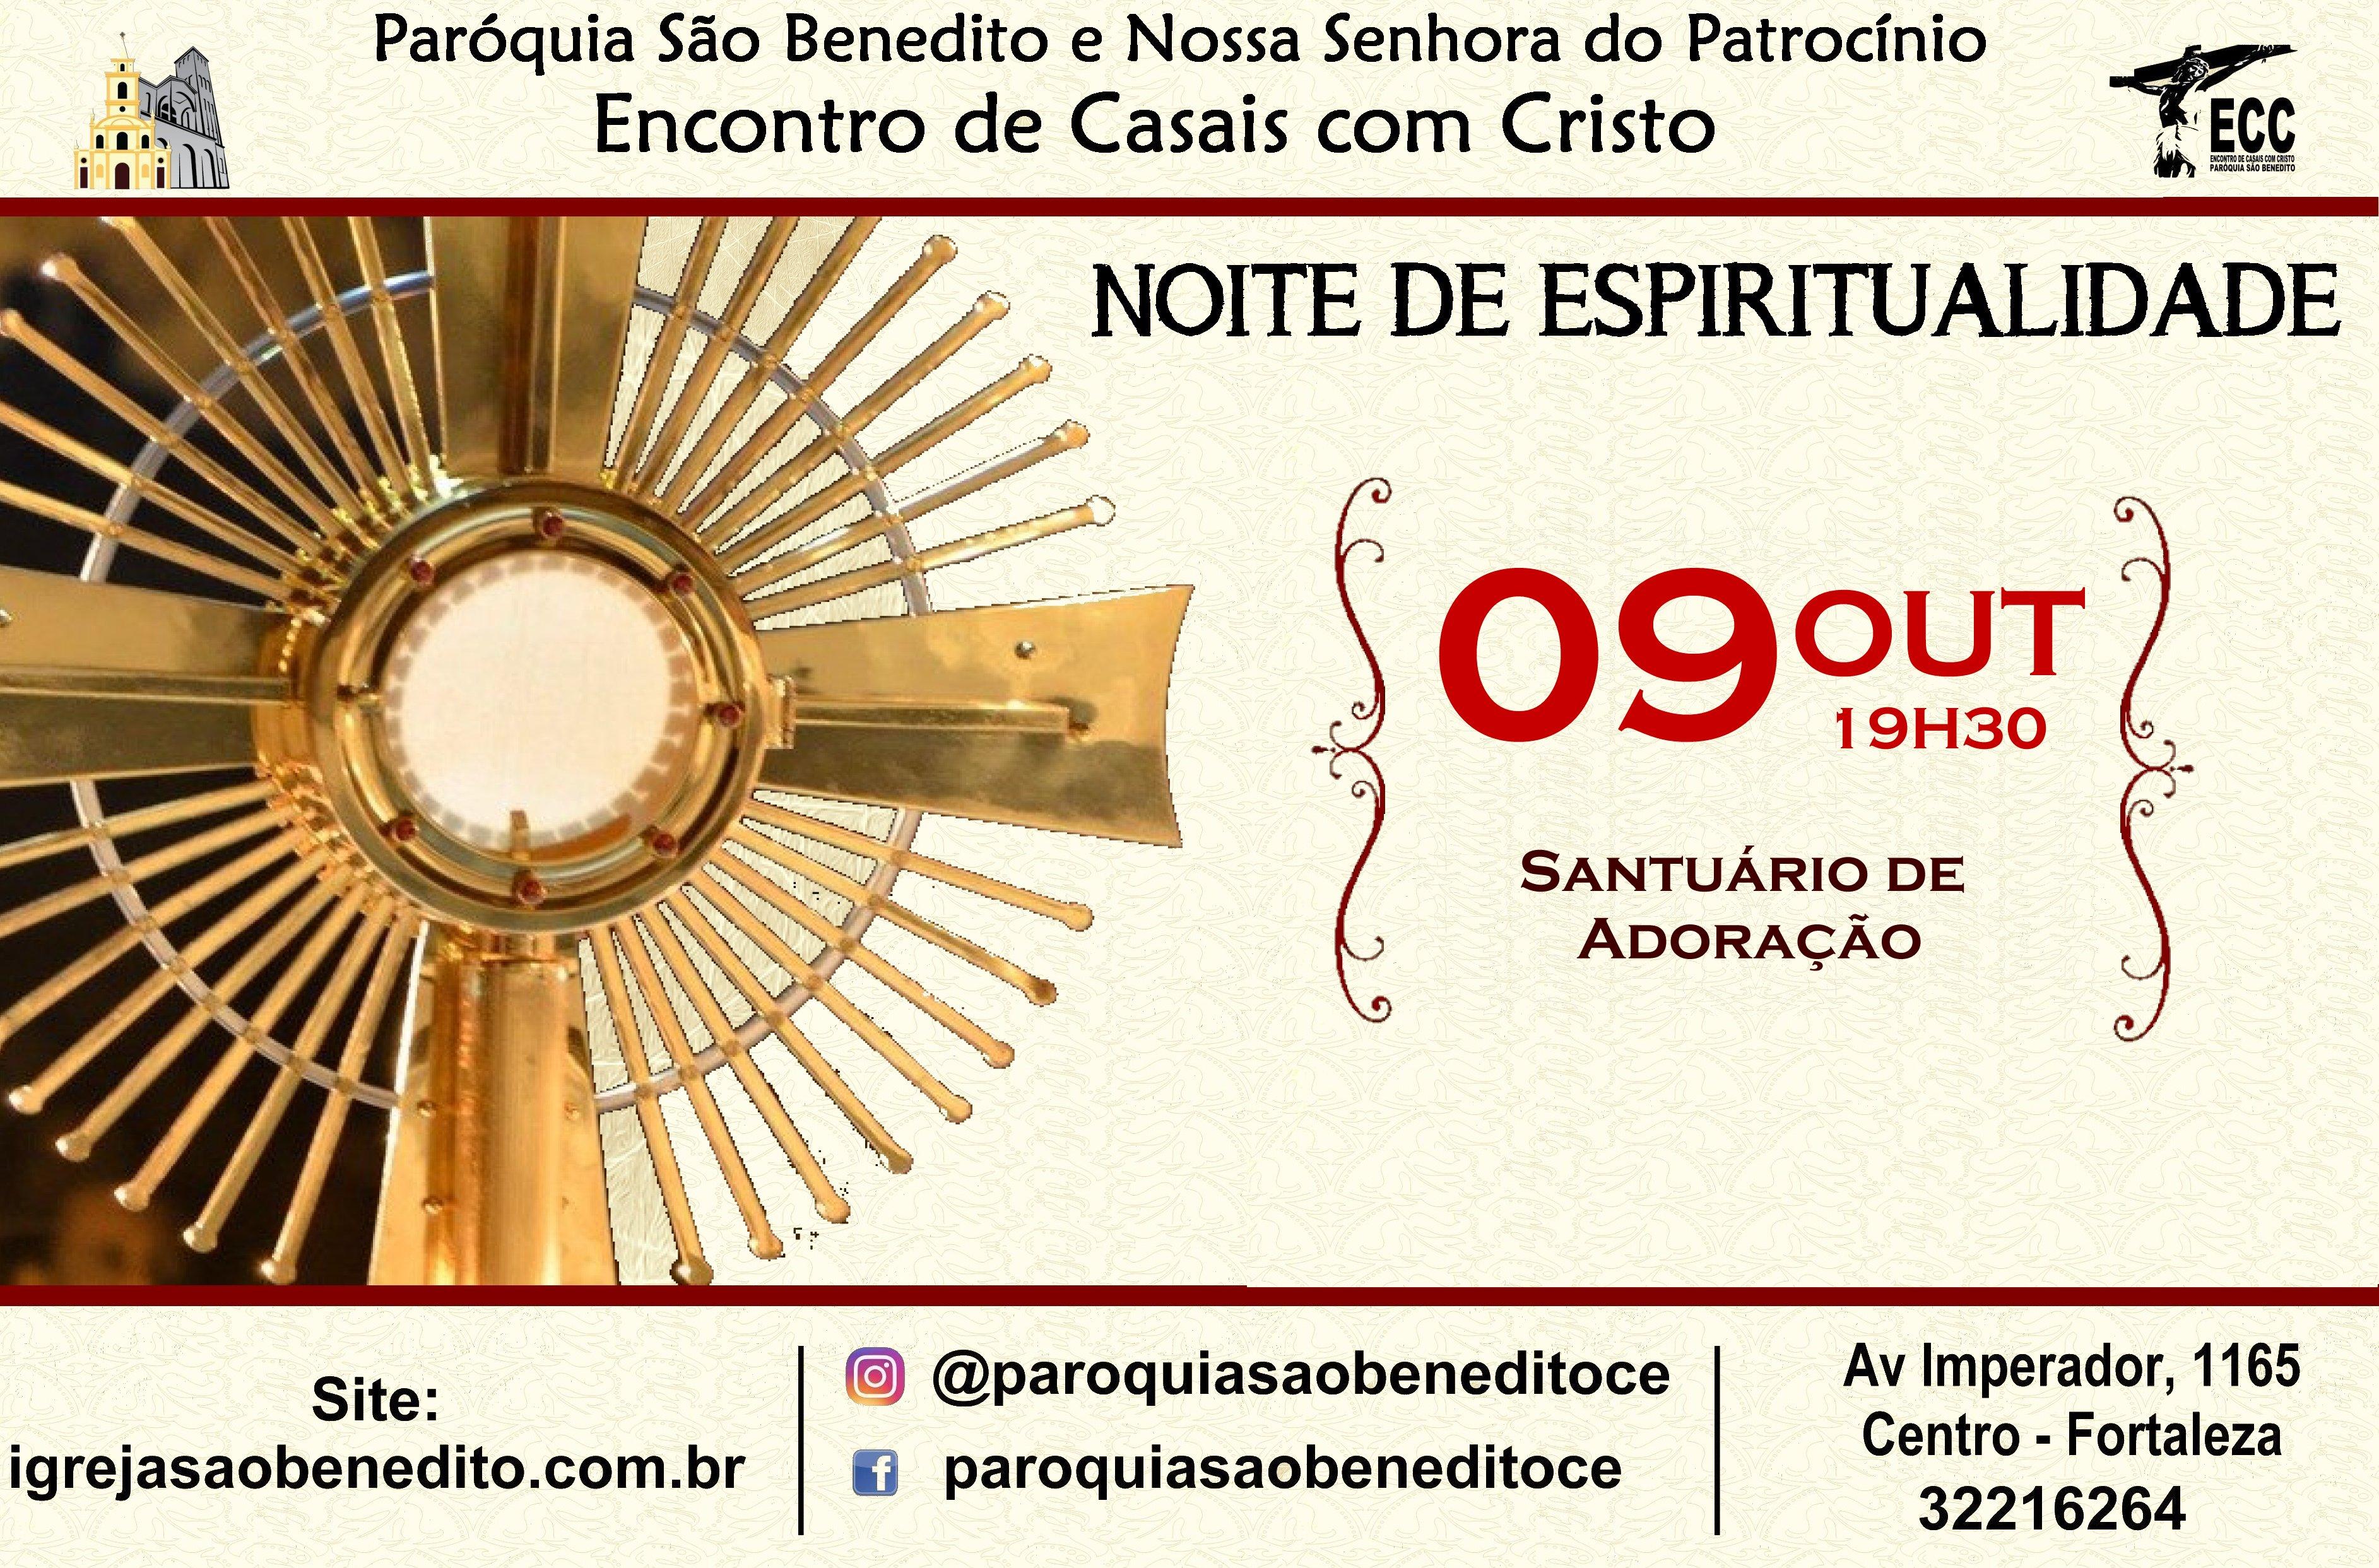 Noite de Espiritualidade dia 09/10. Participe!